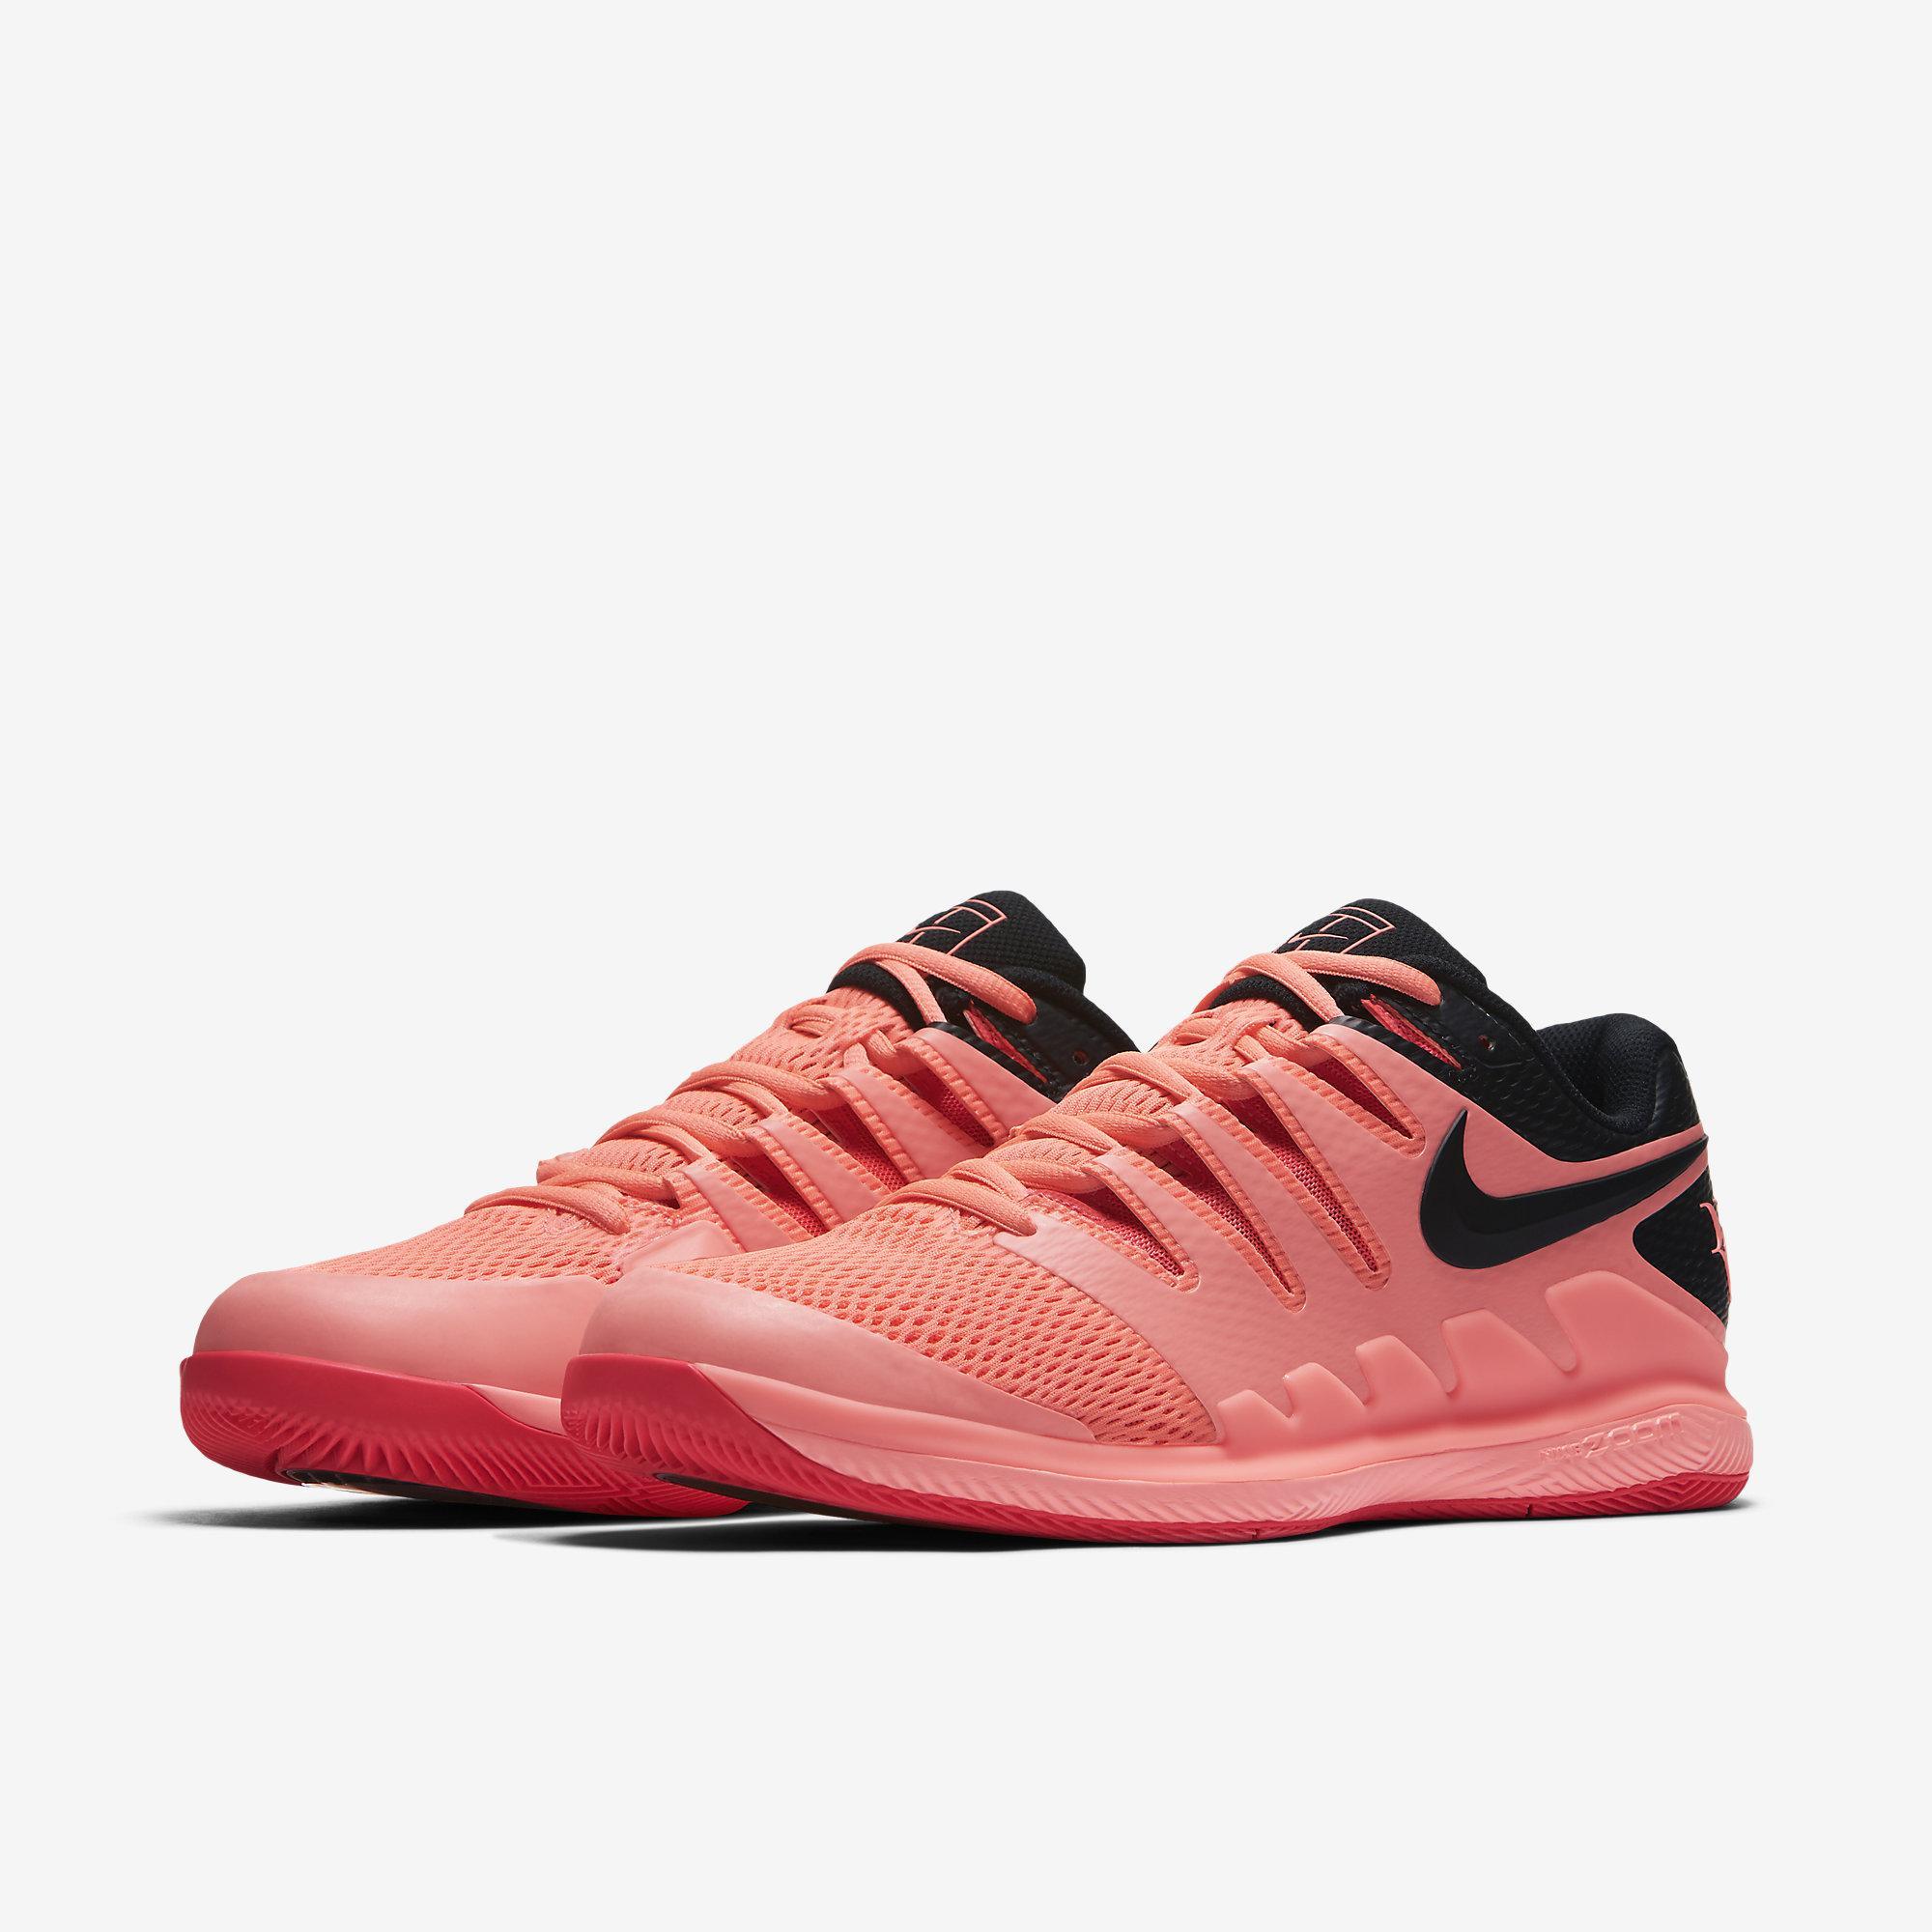 16c34c0b8c111 Nike Mens Air Zoom Vapor X RF Tennis Shoes - Lava Glow Solar Red ...